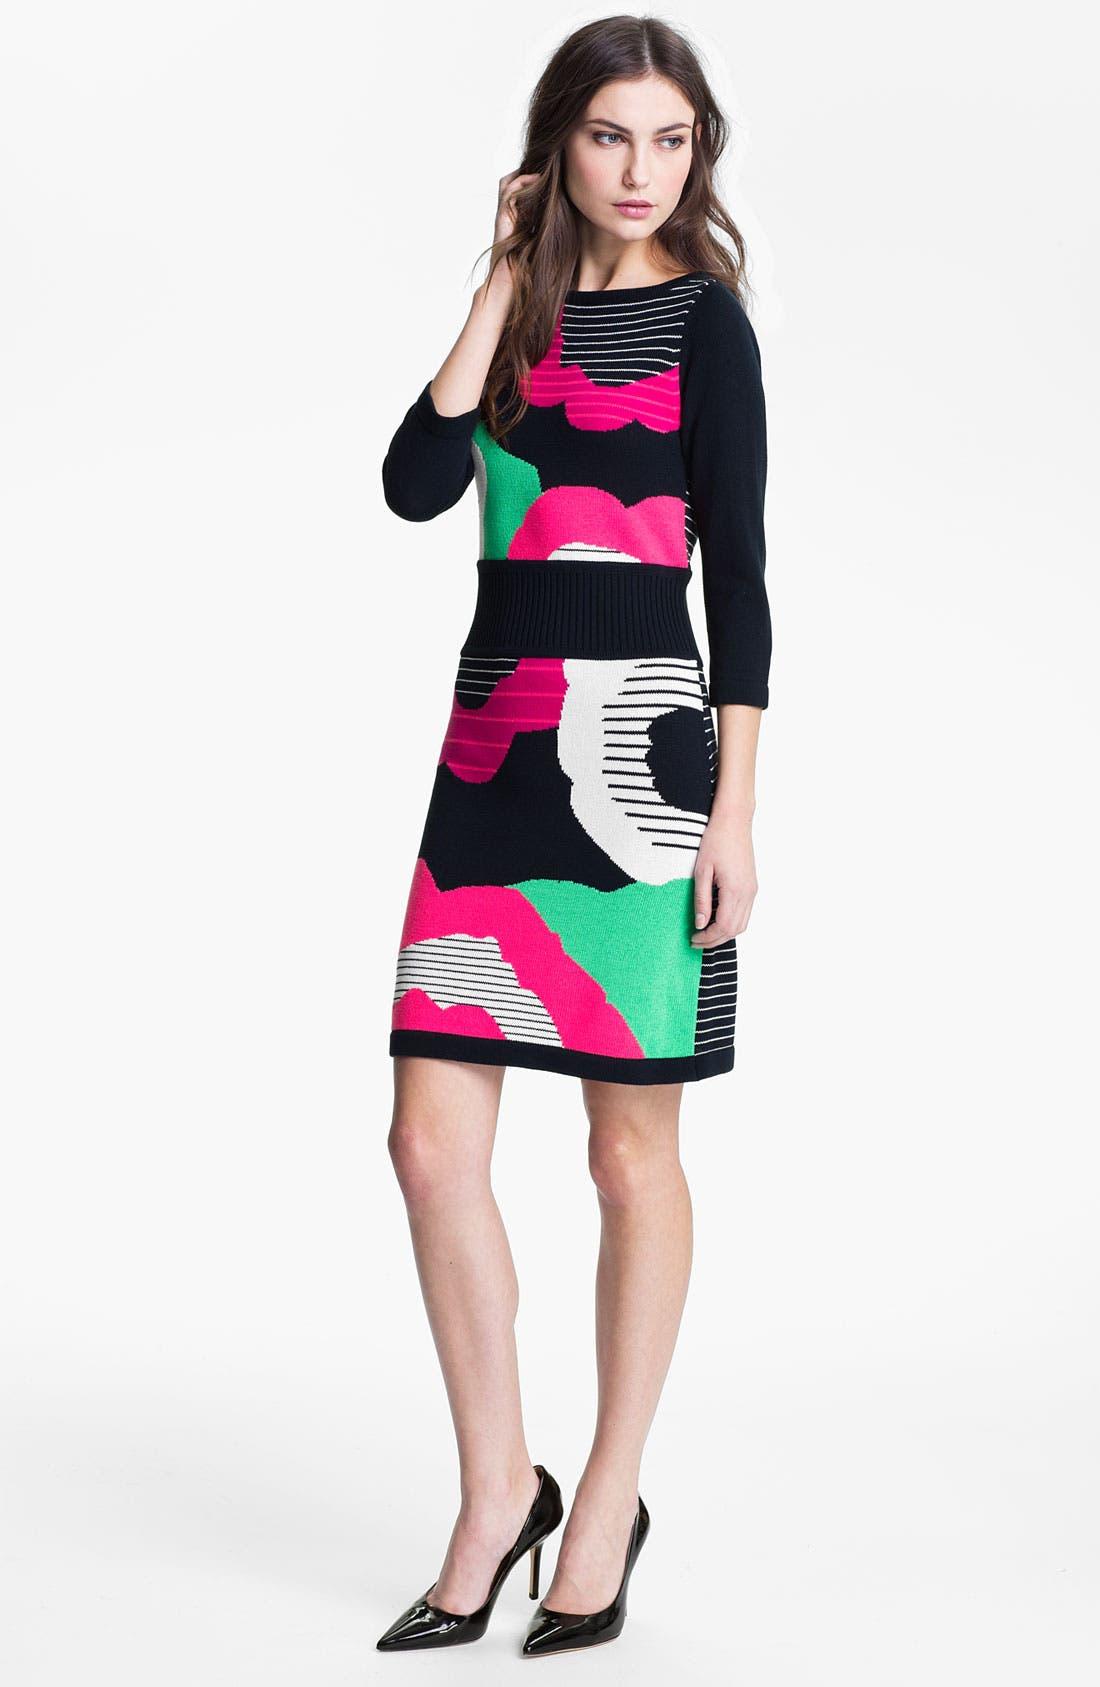 Main Image - Nanette Lepore 'Cartoonist' Cotton Blend Sweater Dress